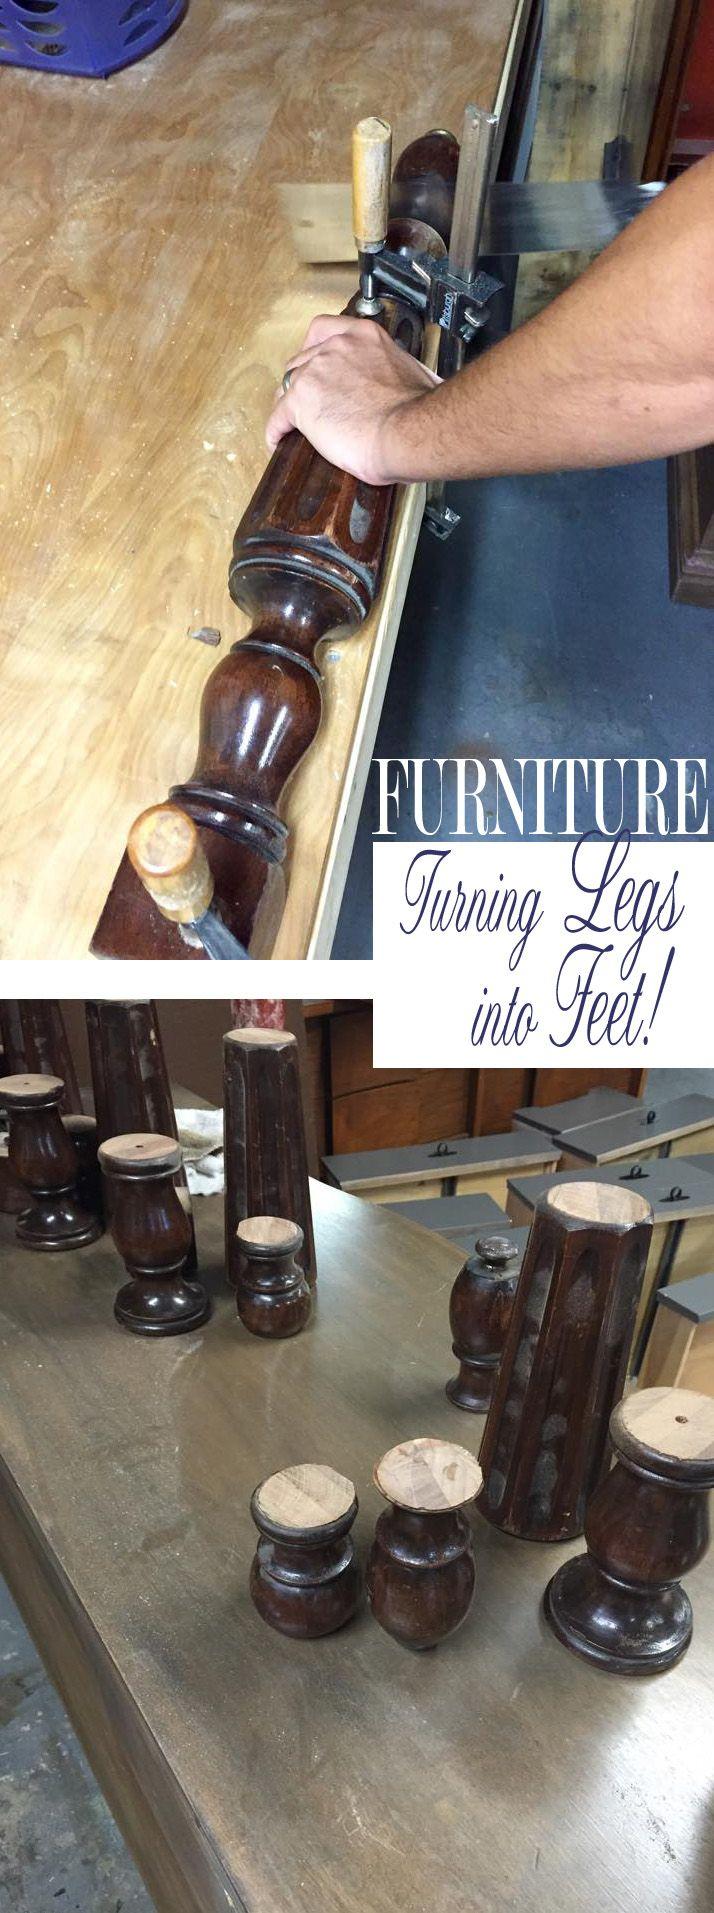 Turn Old Furniture Legs Into New Feet! Furniture legs